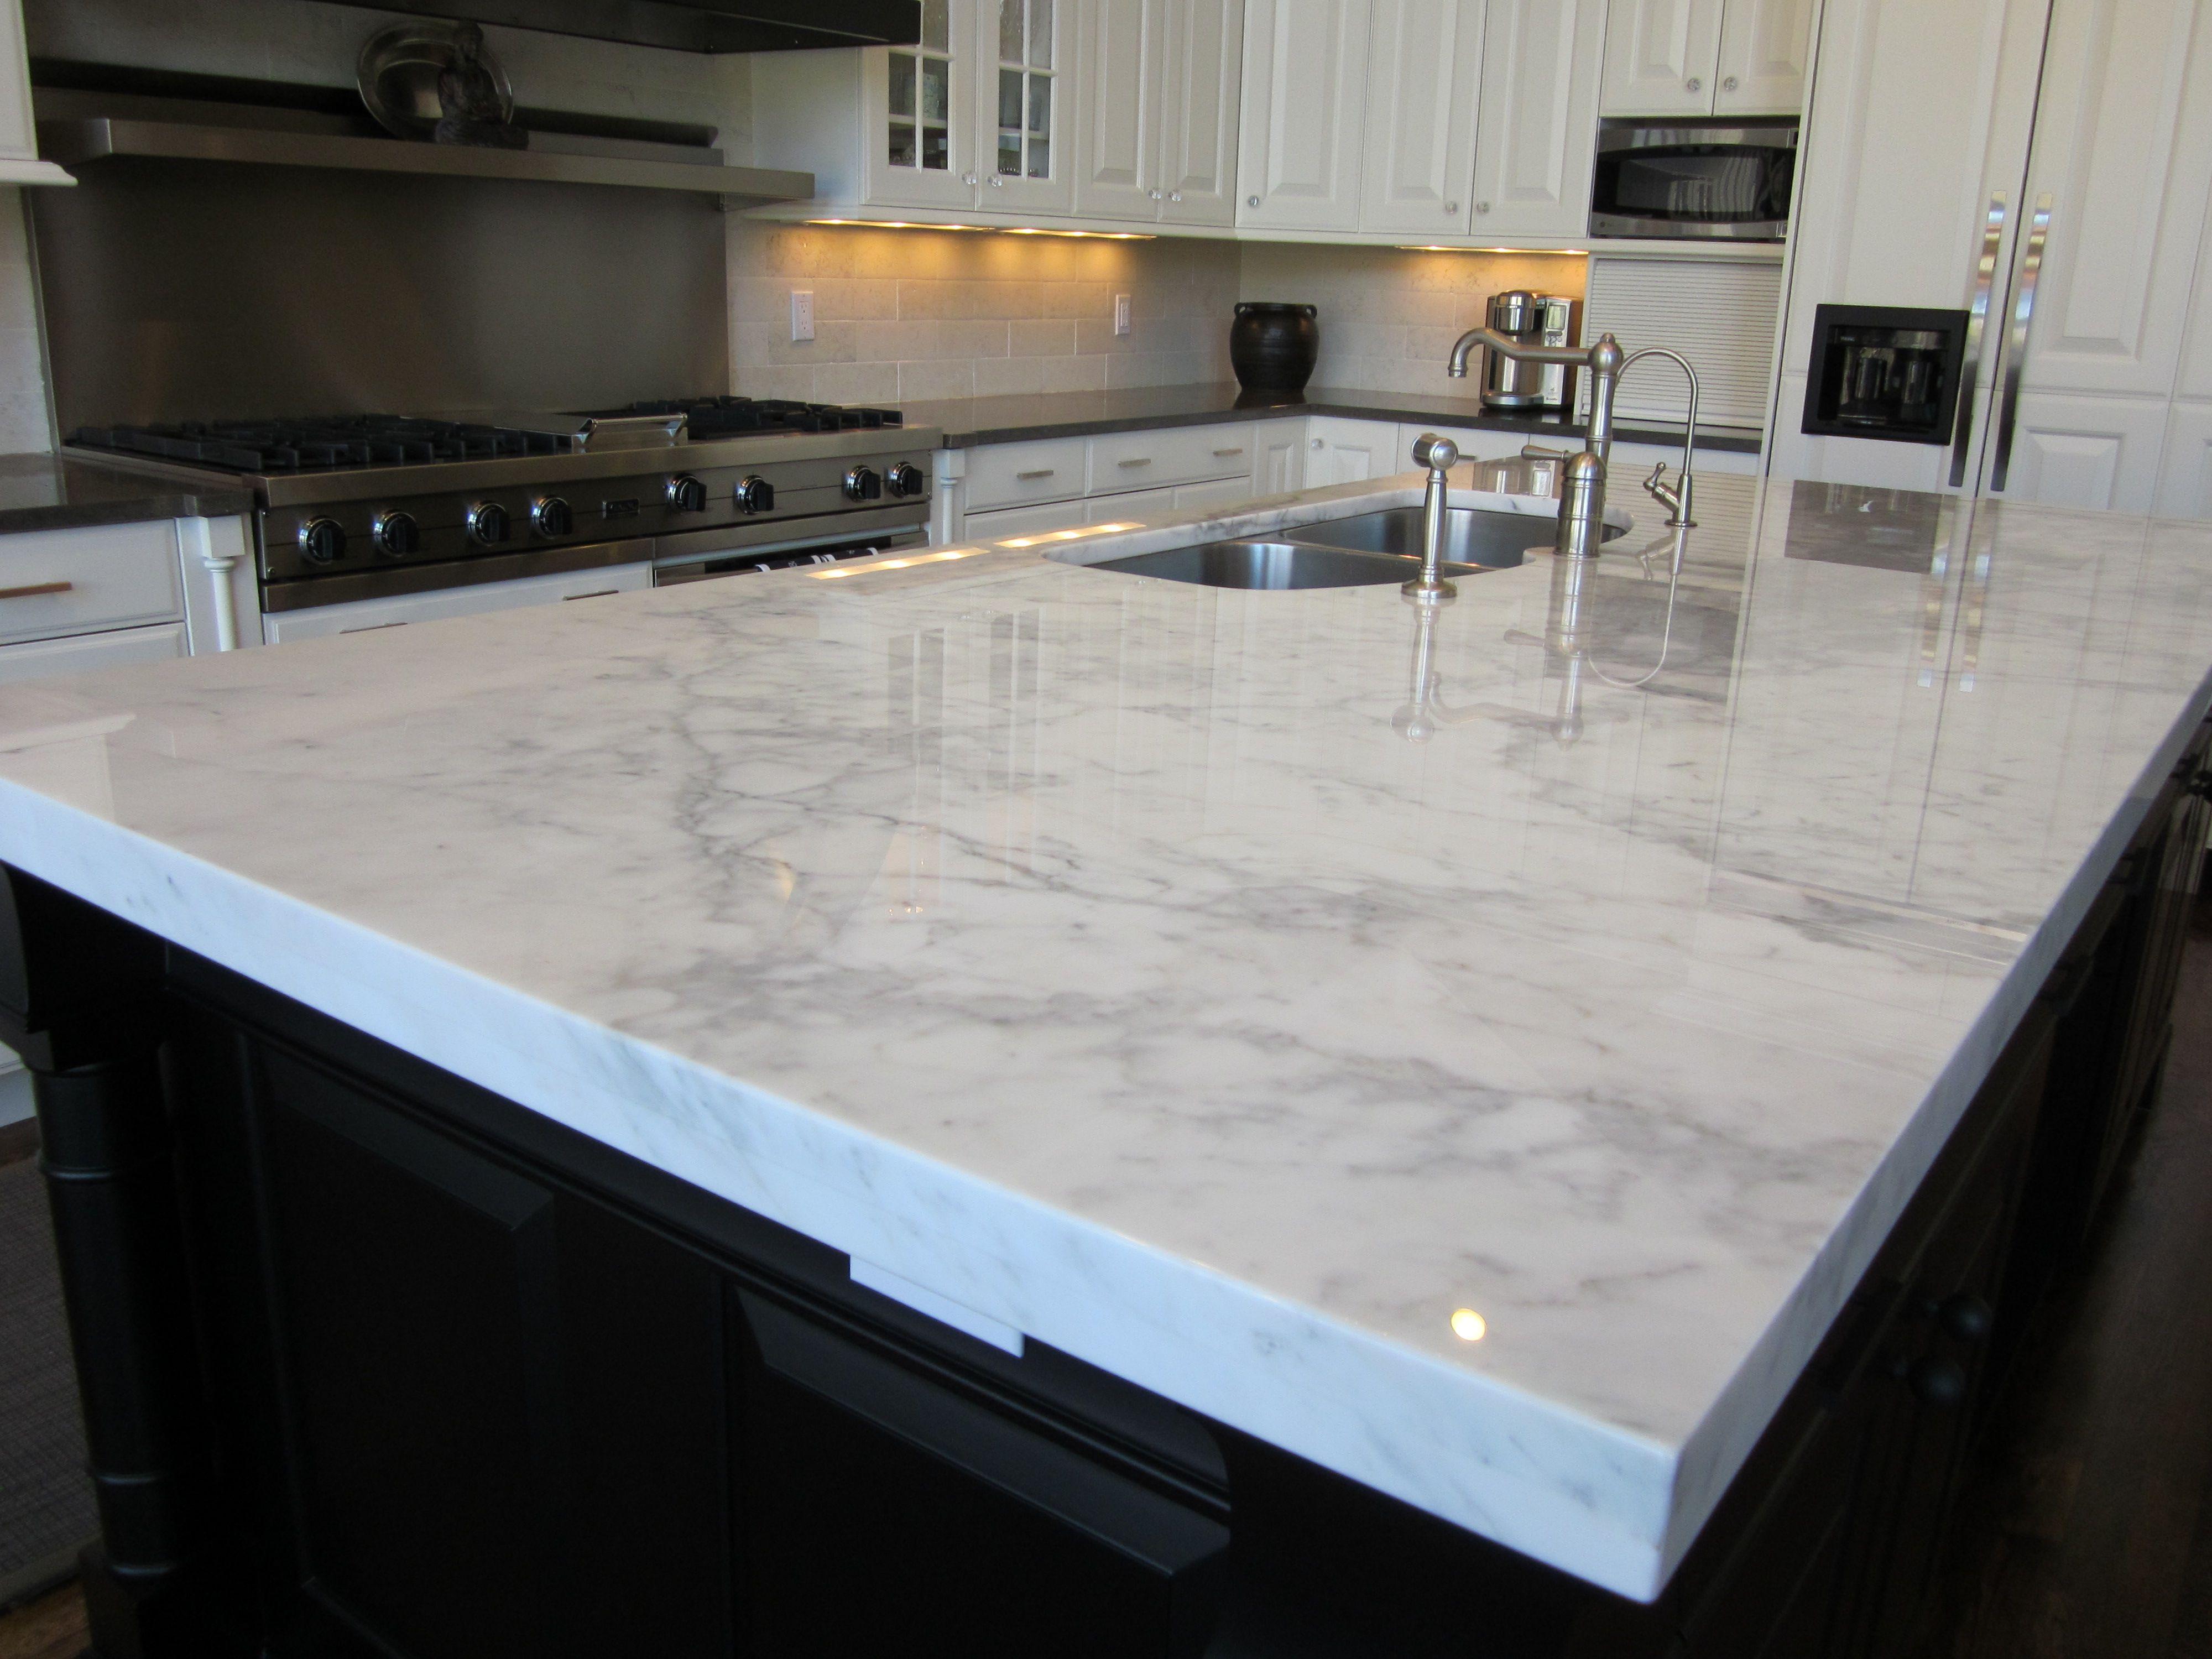 ... Kitchen Countertop White Granite Countertops Quartzite Countertops  Countertops For Kitchen Countertop Options Countertops Marble Look Granite  ...